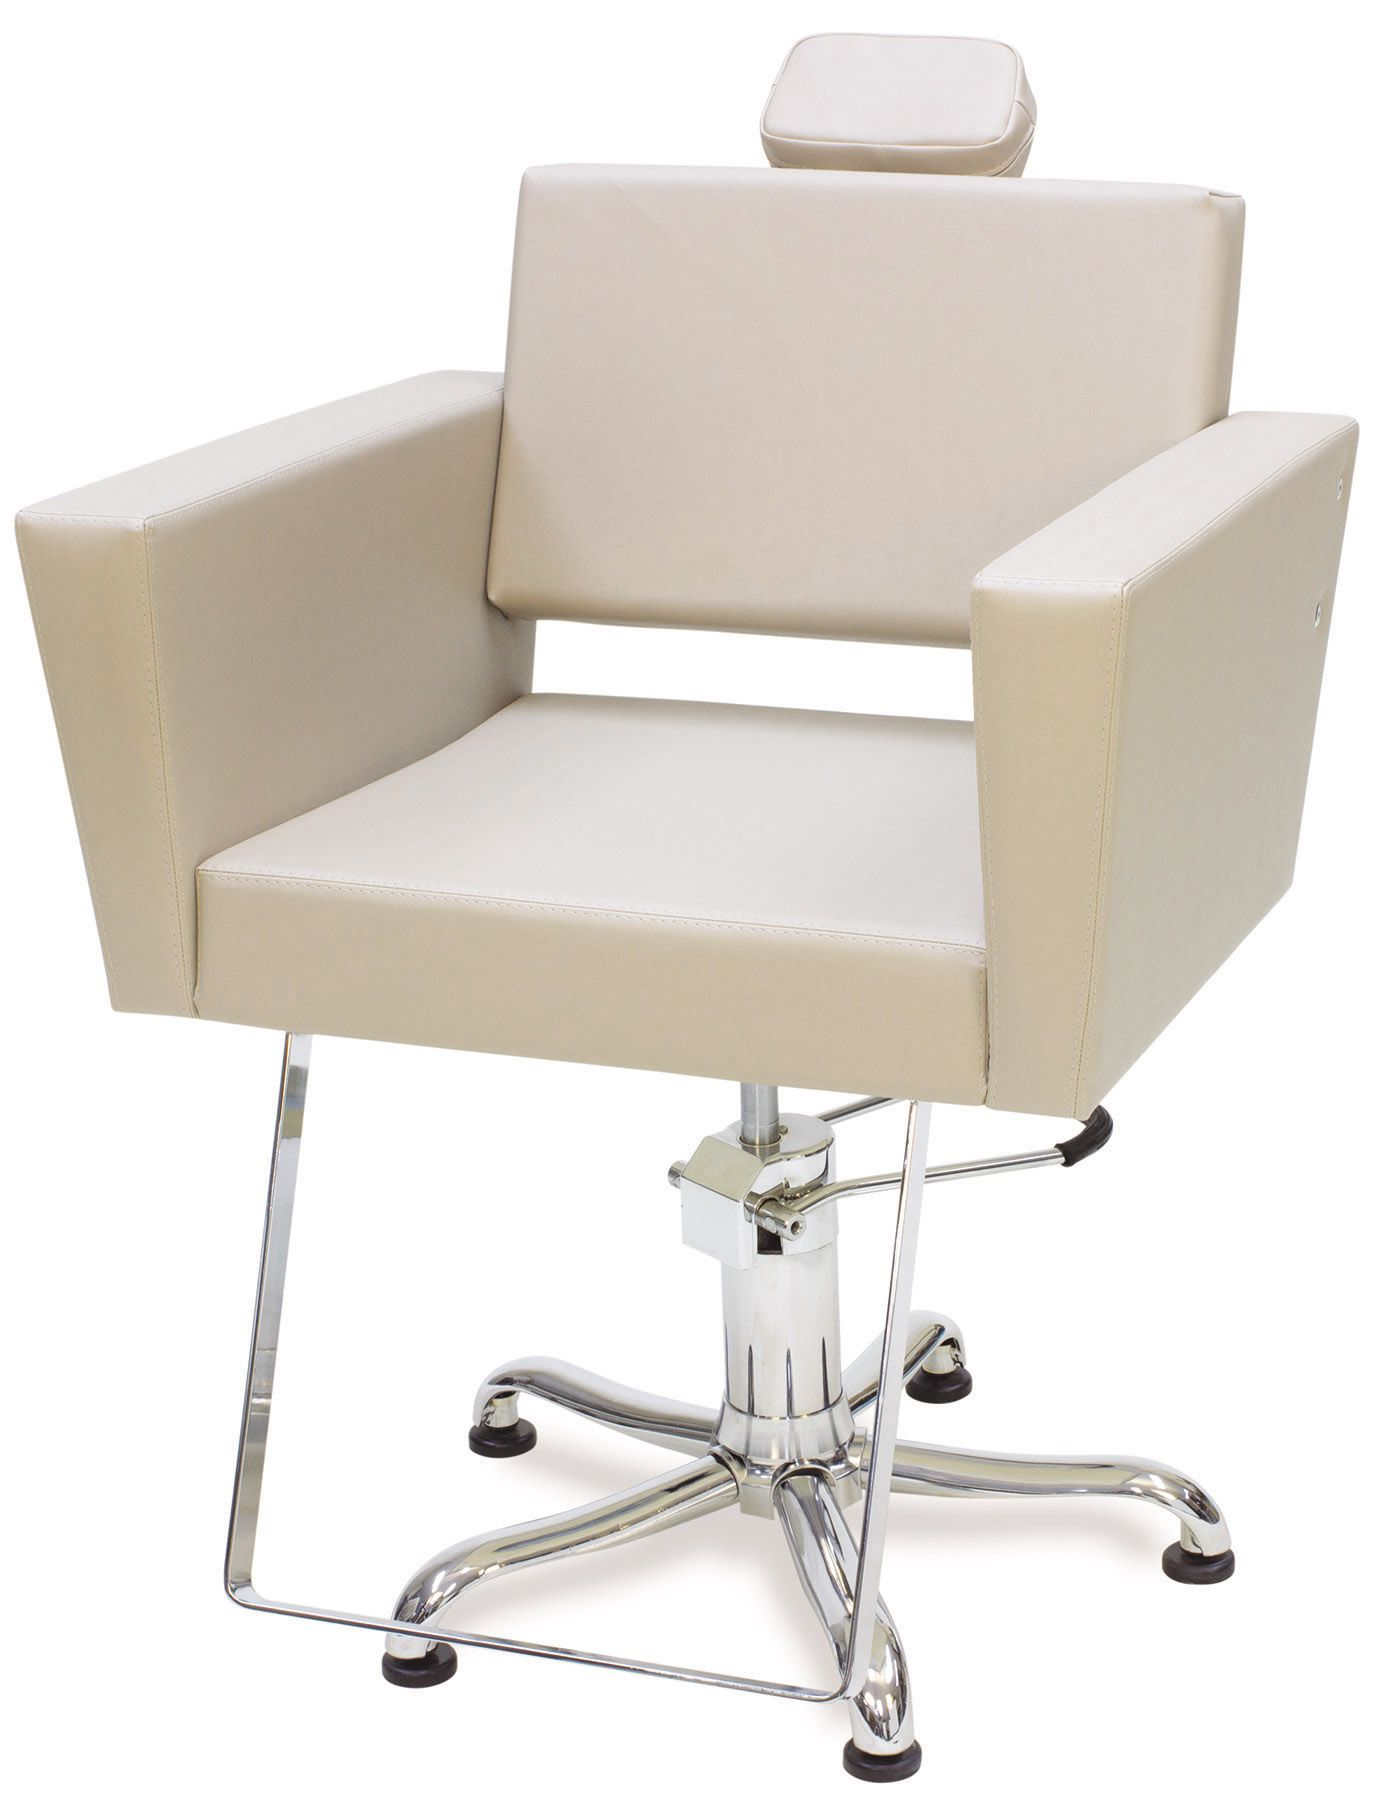 Cadeira Poltrona Kixiki Niágara Fixa Bege